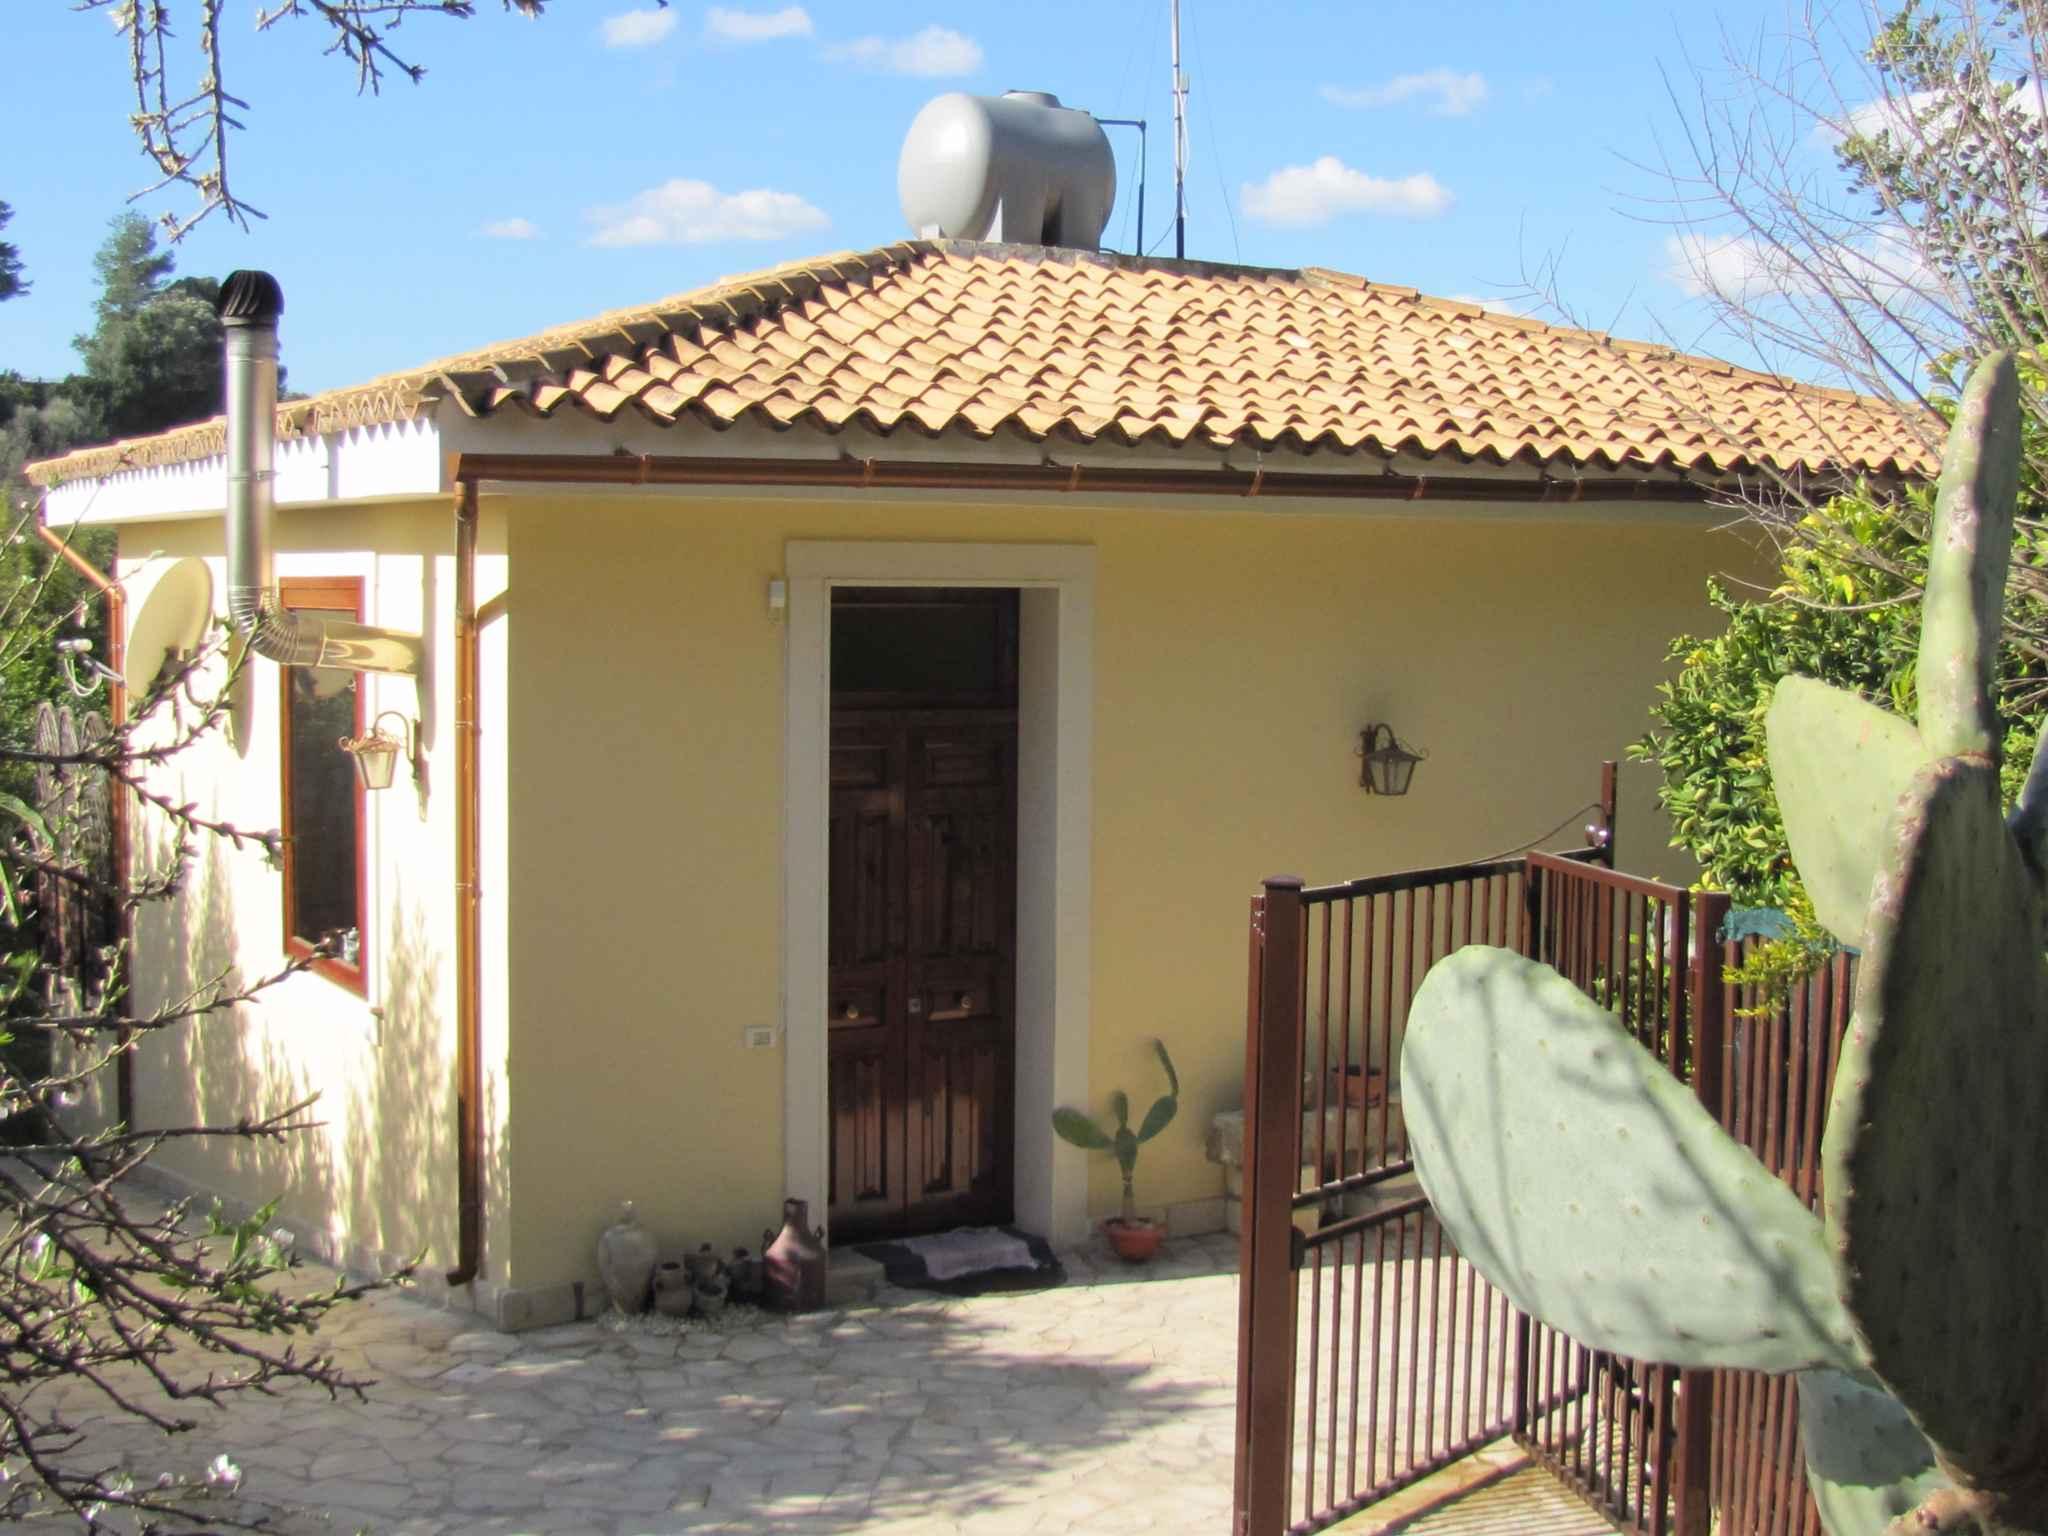 Maison de vacances mit Blick auf Zitronengarten (317534), Lido di Noto, Siracusa, Sicile, Italie, image 2